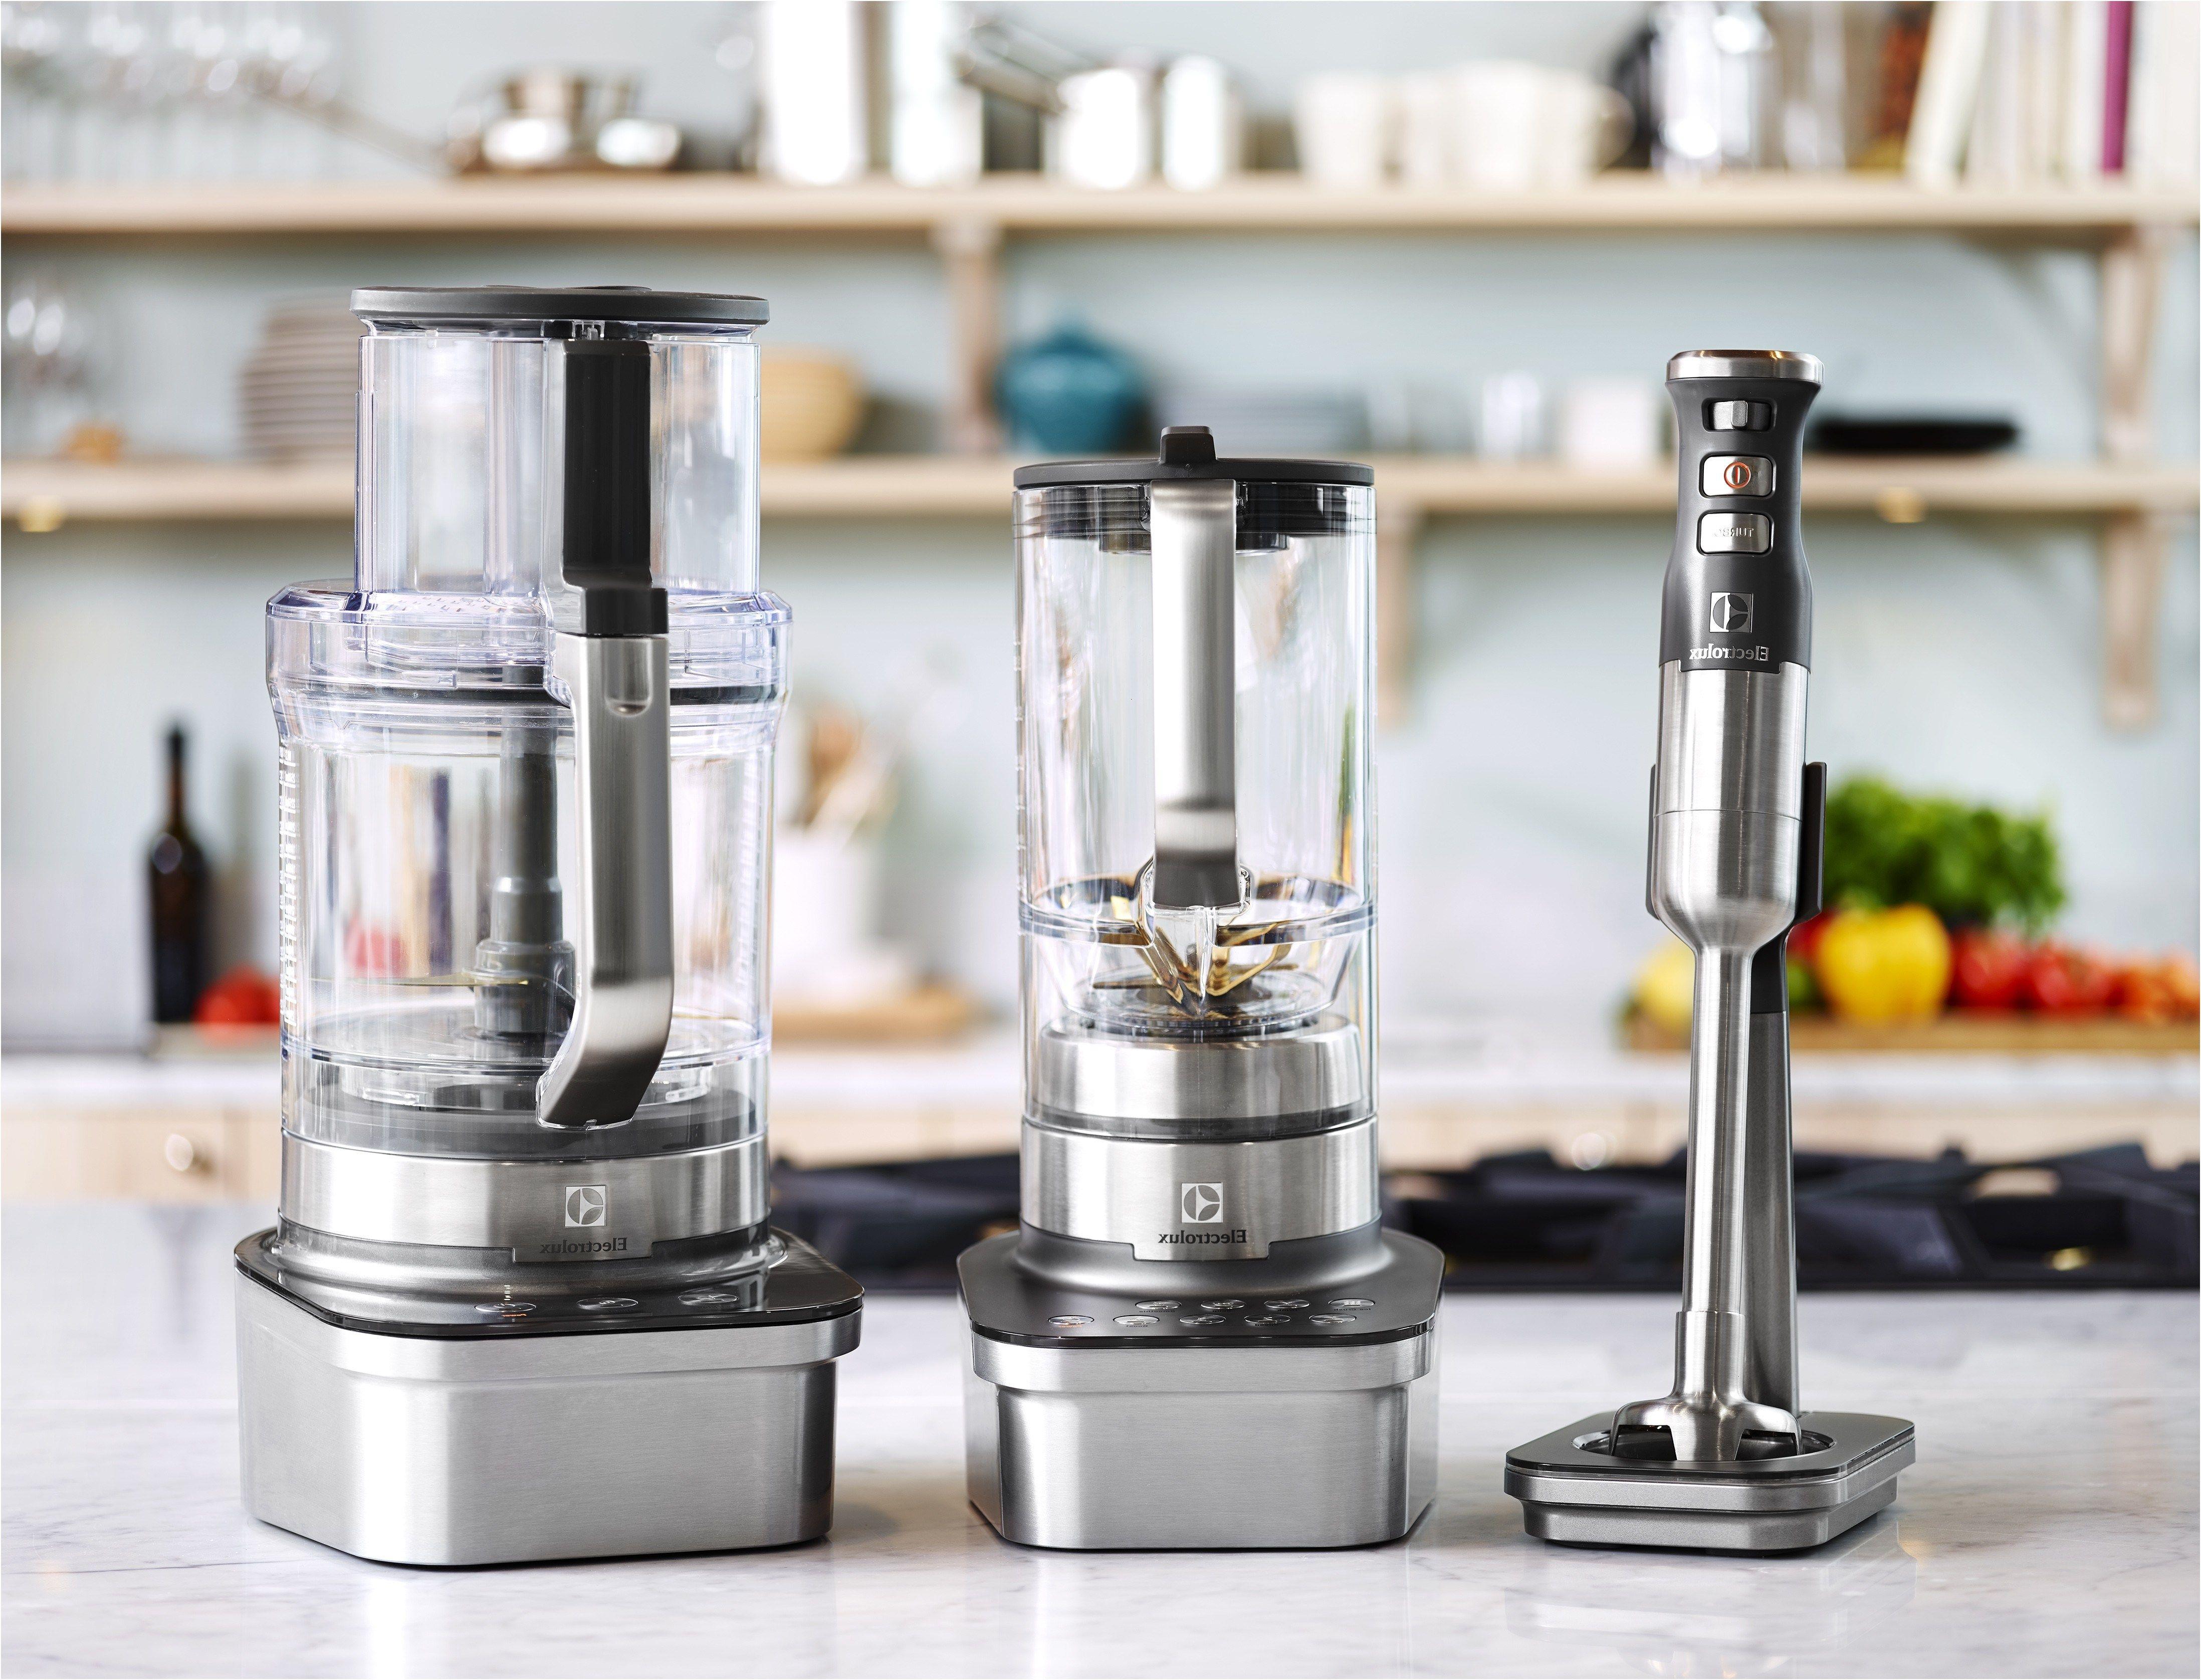 229 Best Kitchen Appliances Images On Pinterest Kitchen From Best New Best Kitchen Appliances 2018